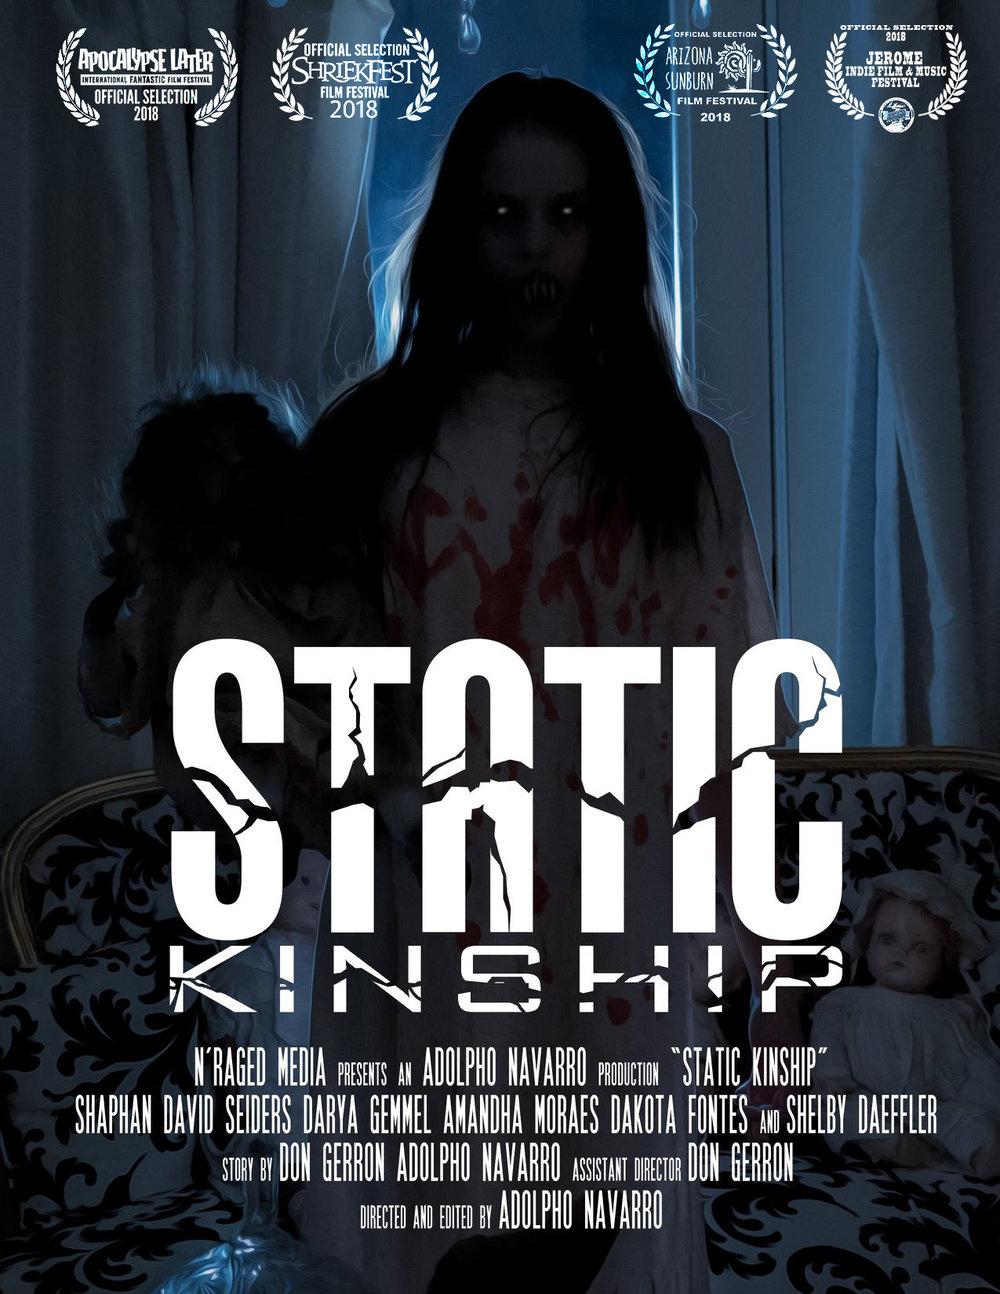 Static Kinship - Official SelectionShriekfest Film Festival 2018Jerome Film Festival 2018Arizona Sunburn Film Festival 2018Apocalypse Later Film Festival 2018